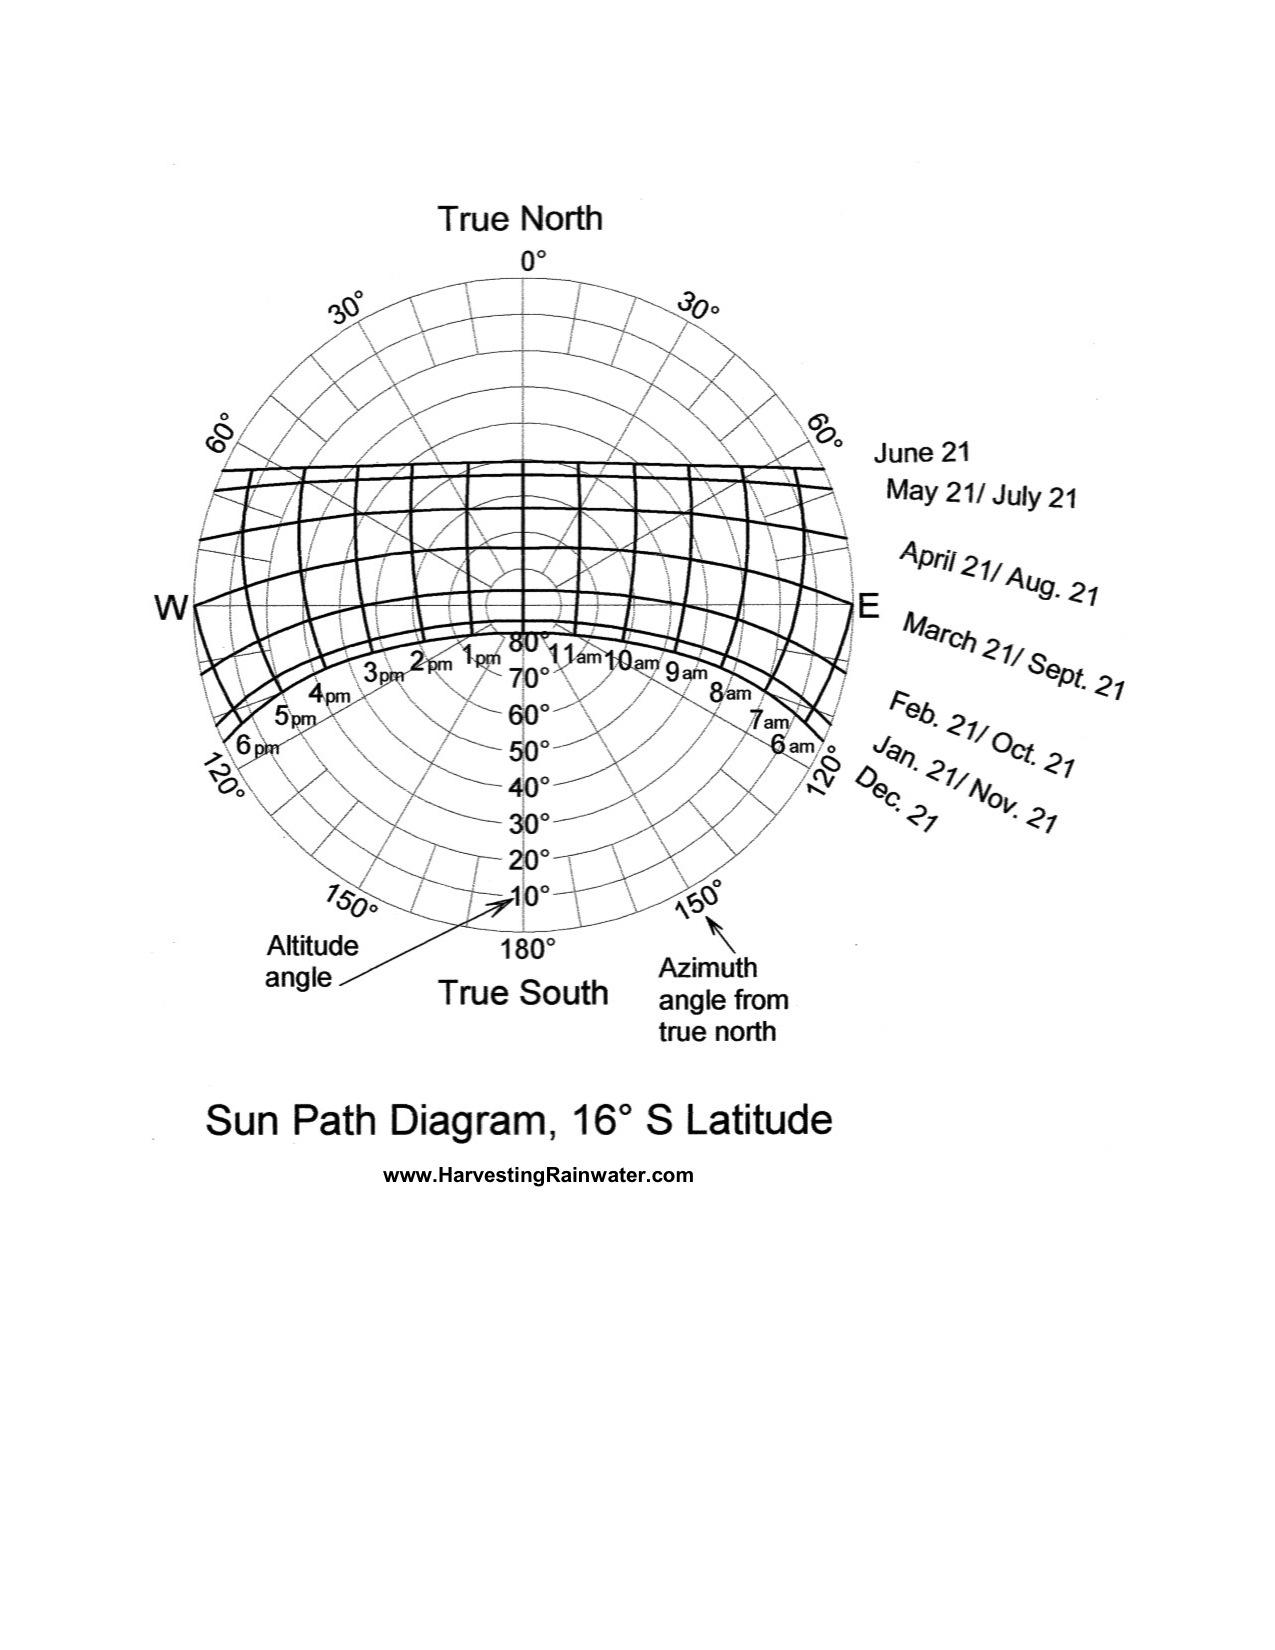 Sun Path Diagram 16o S Latitude